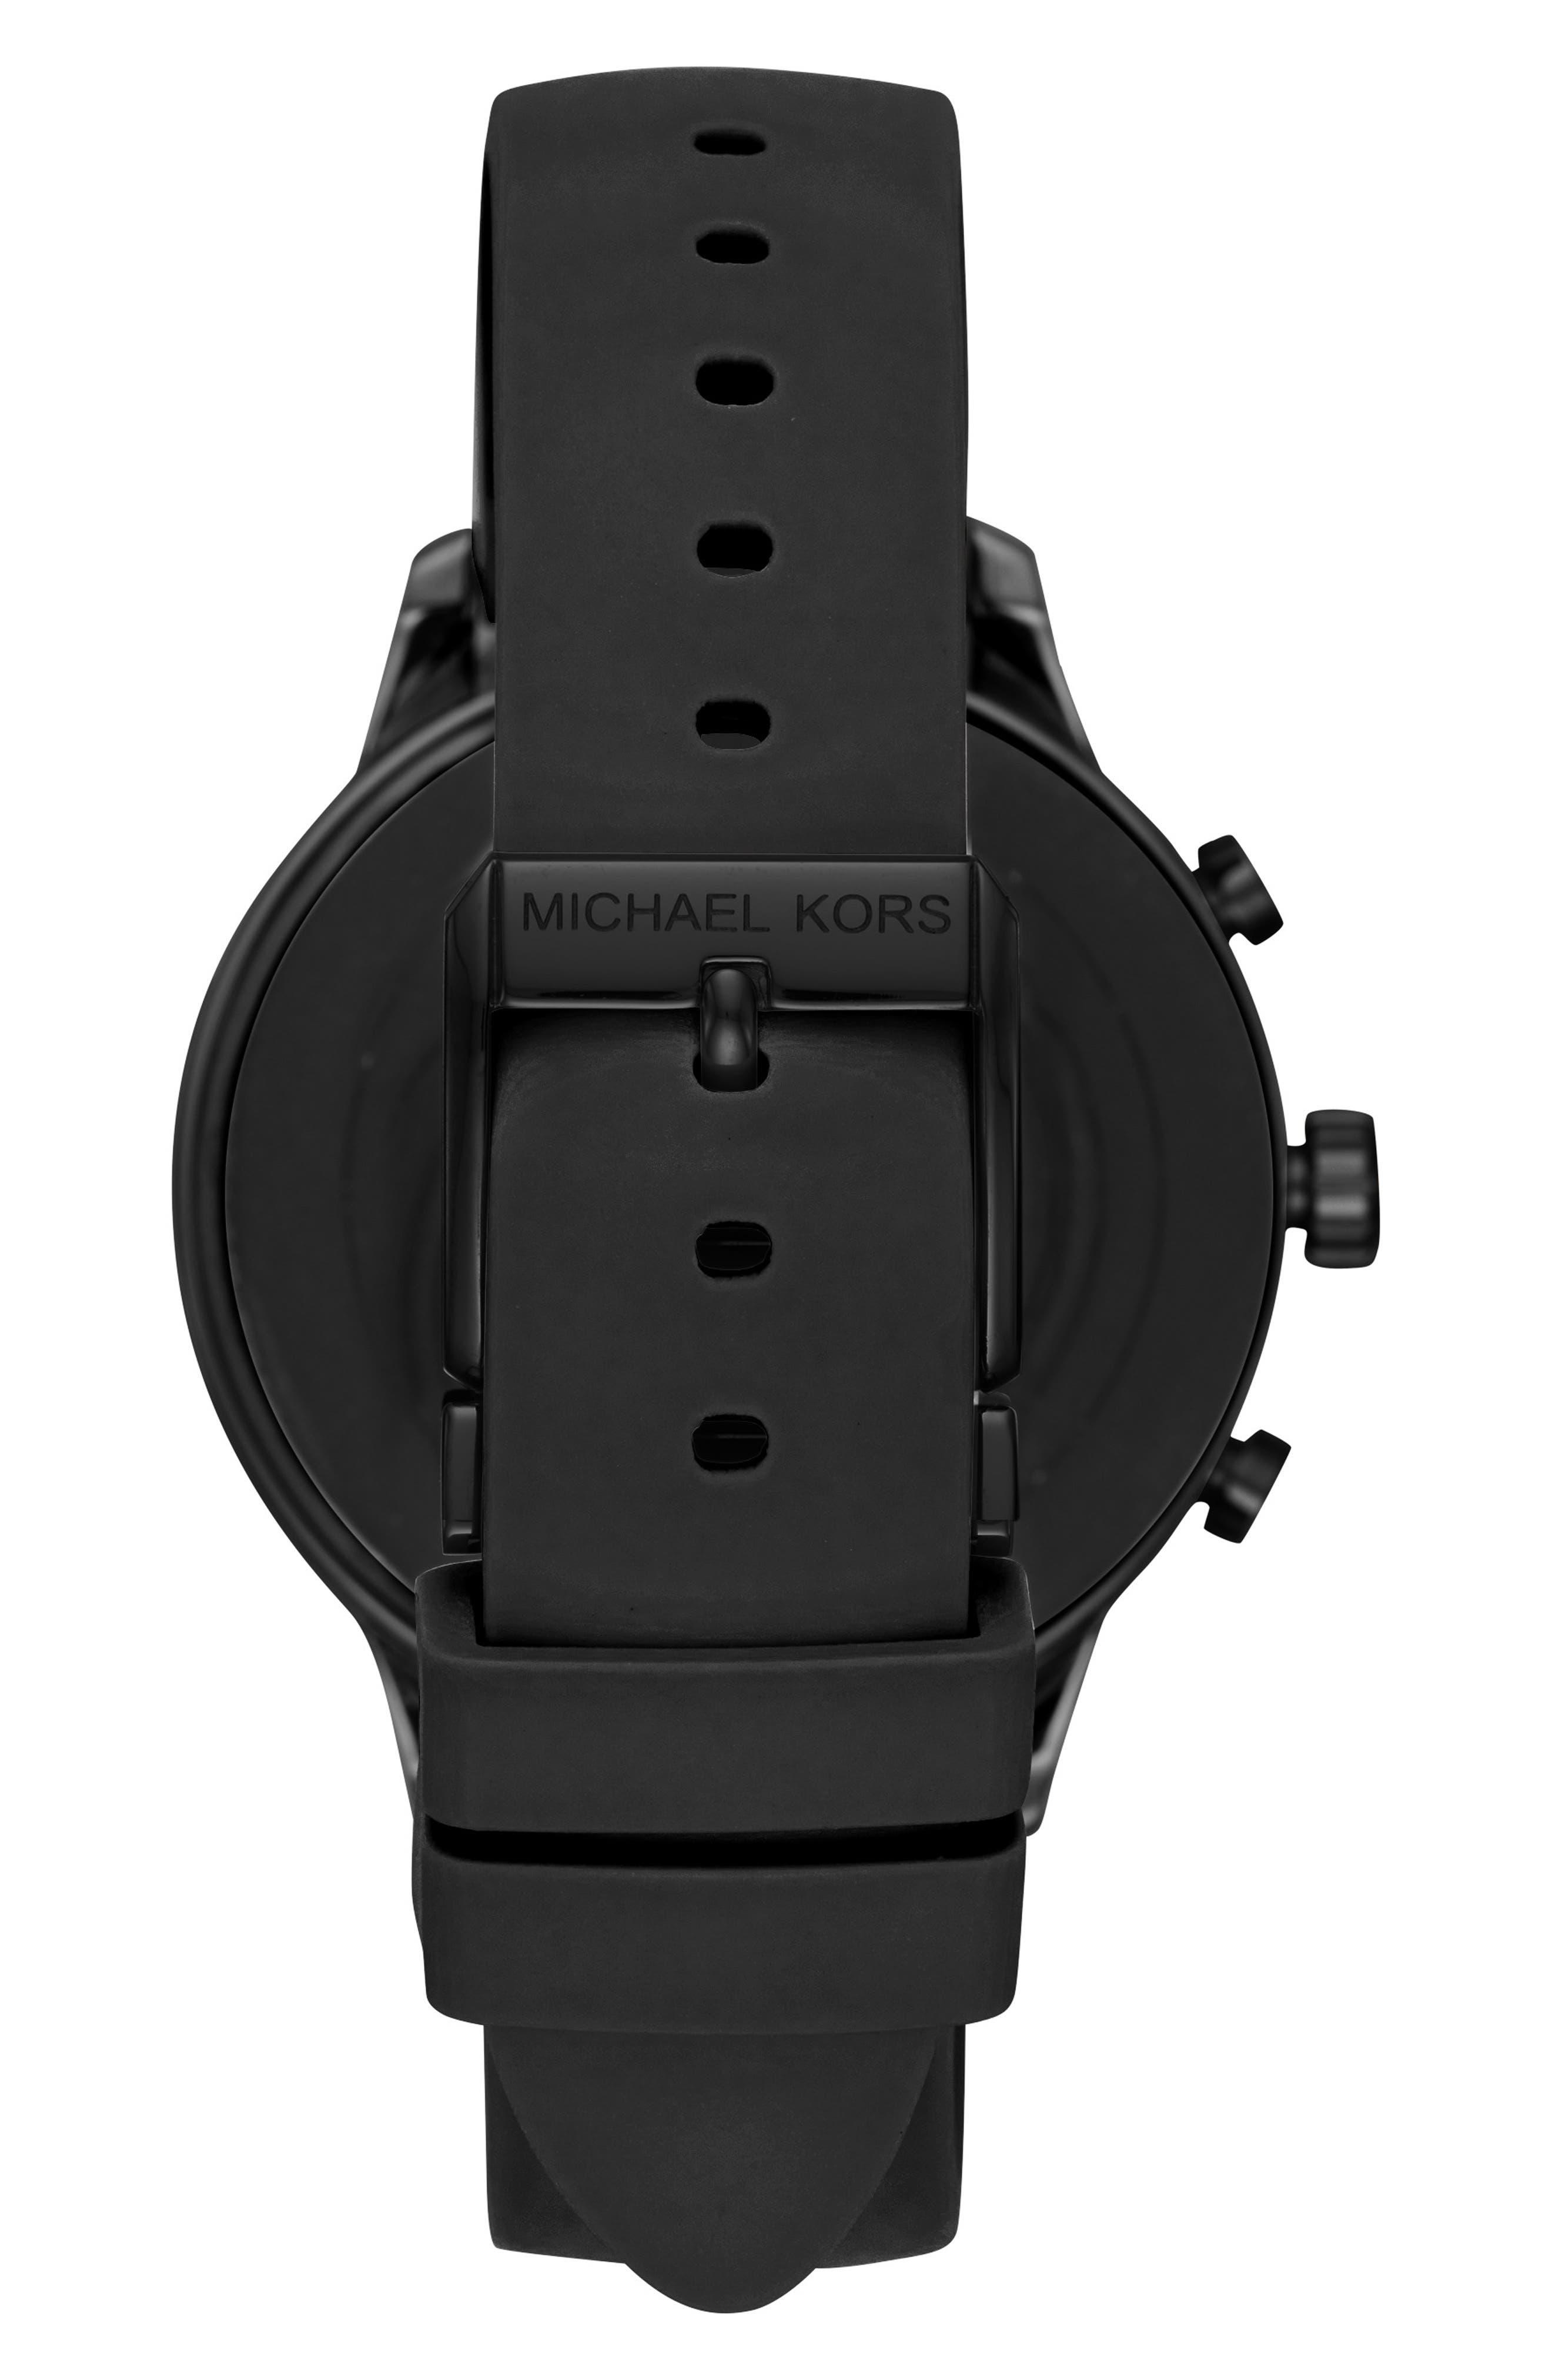 MICHAEL KORS, MICHAEL Michael Kors Access Runway Smart Watch, 41mm, Alternate thumbnail 2, color, 001